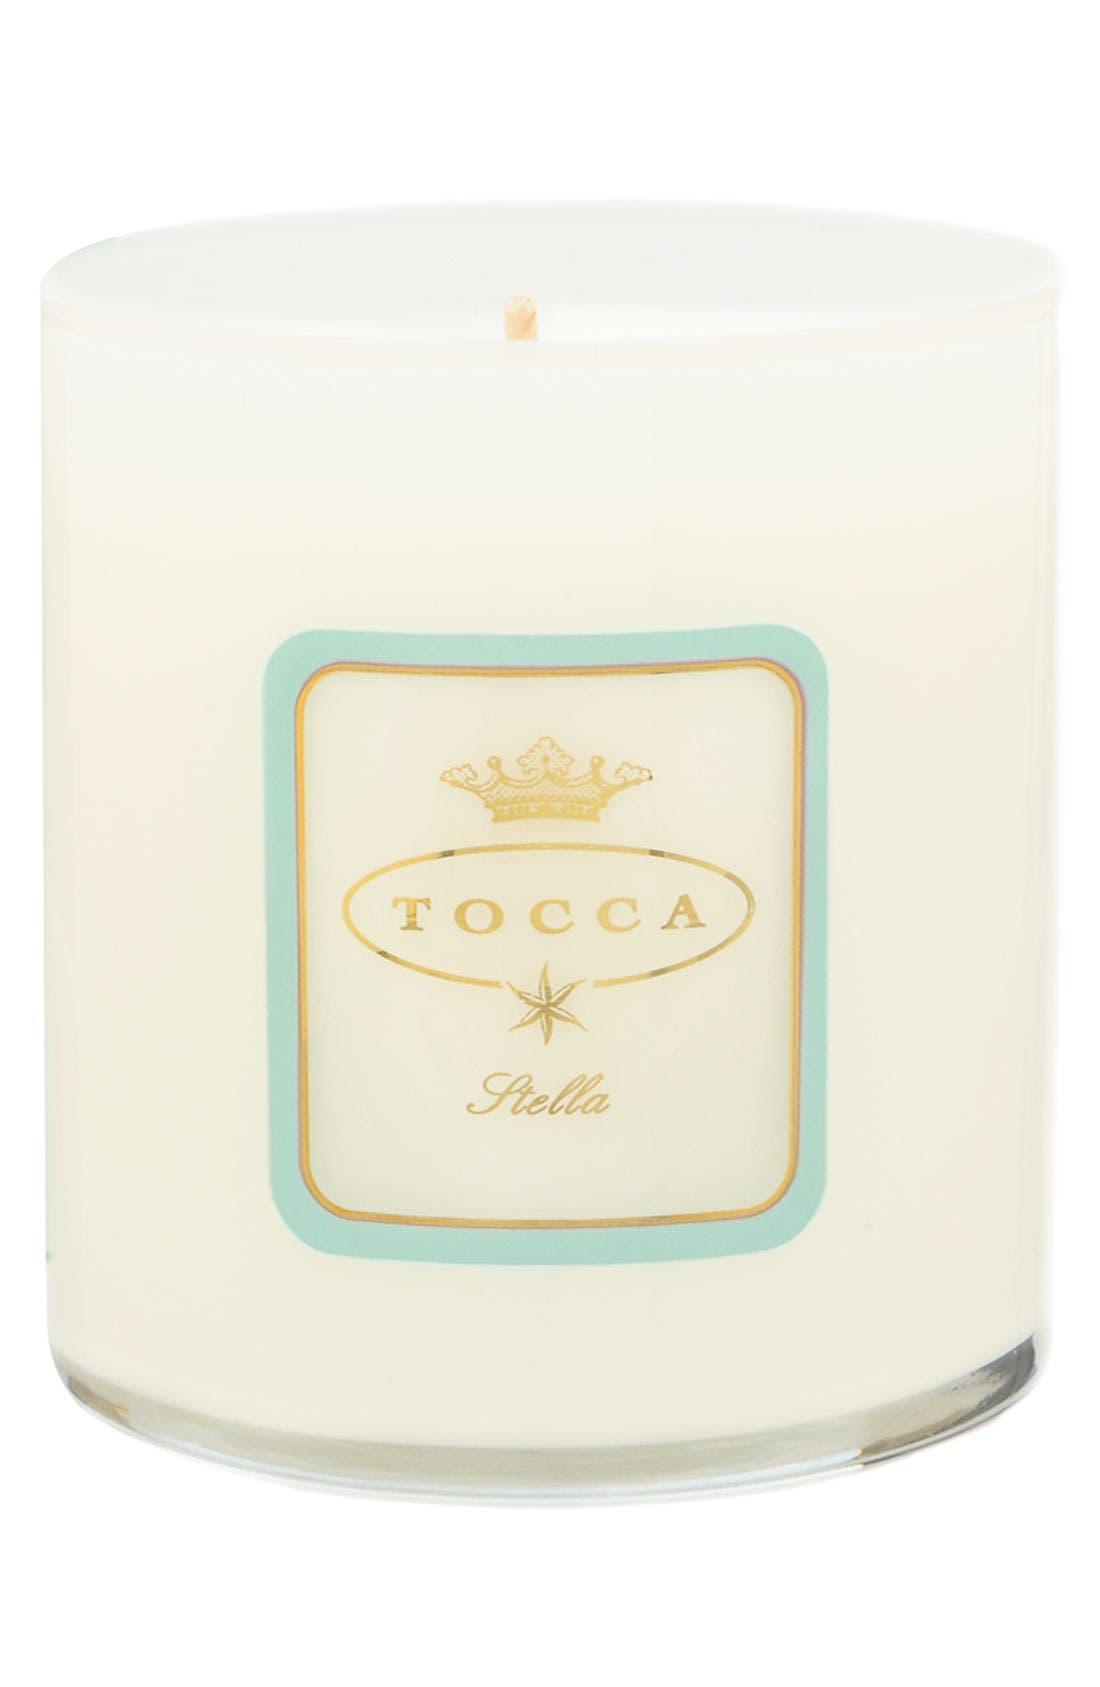 Alternate Image 1 Selected - TOCCA 'Stella' Candela